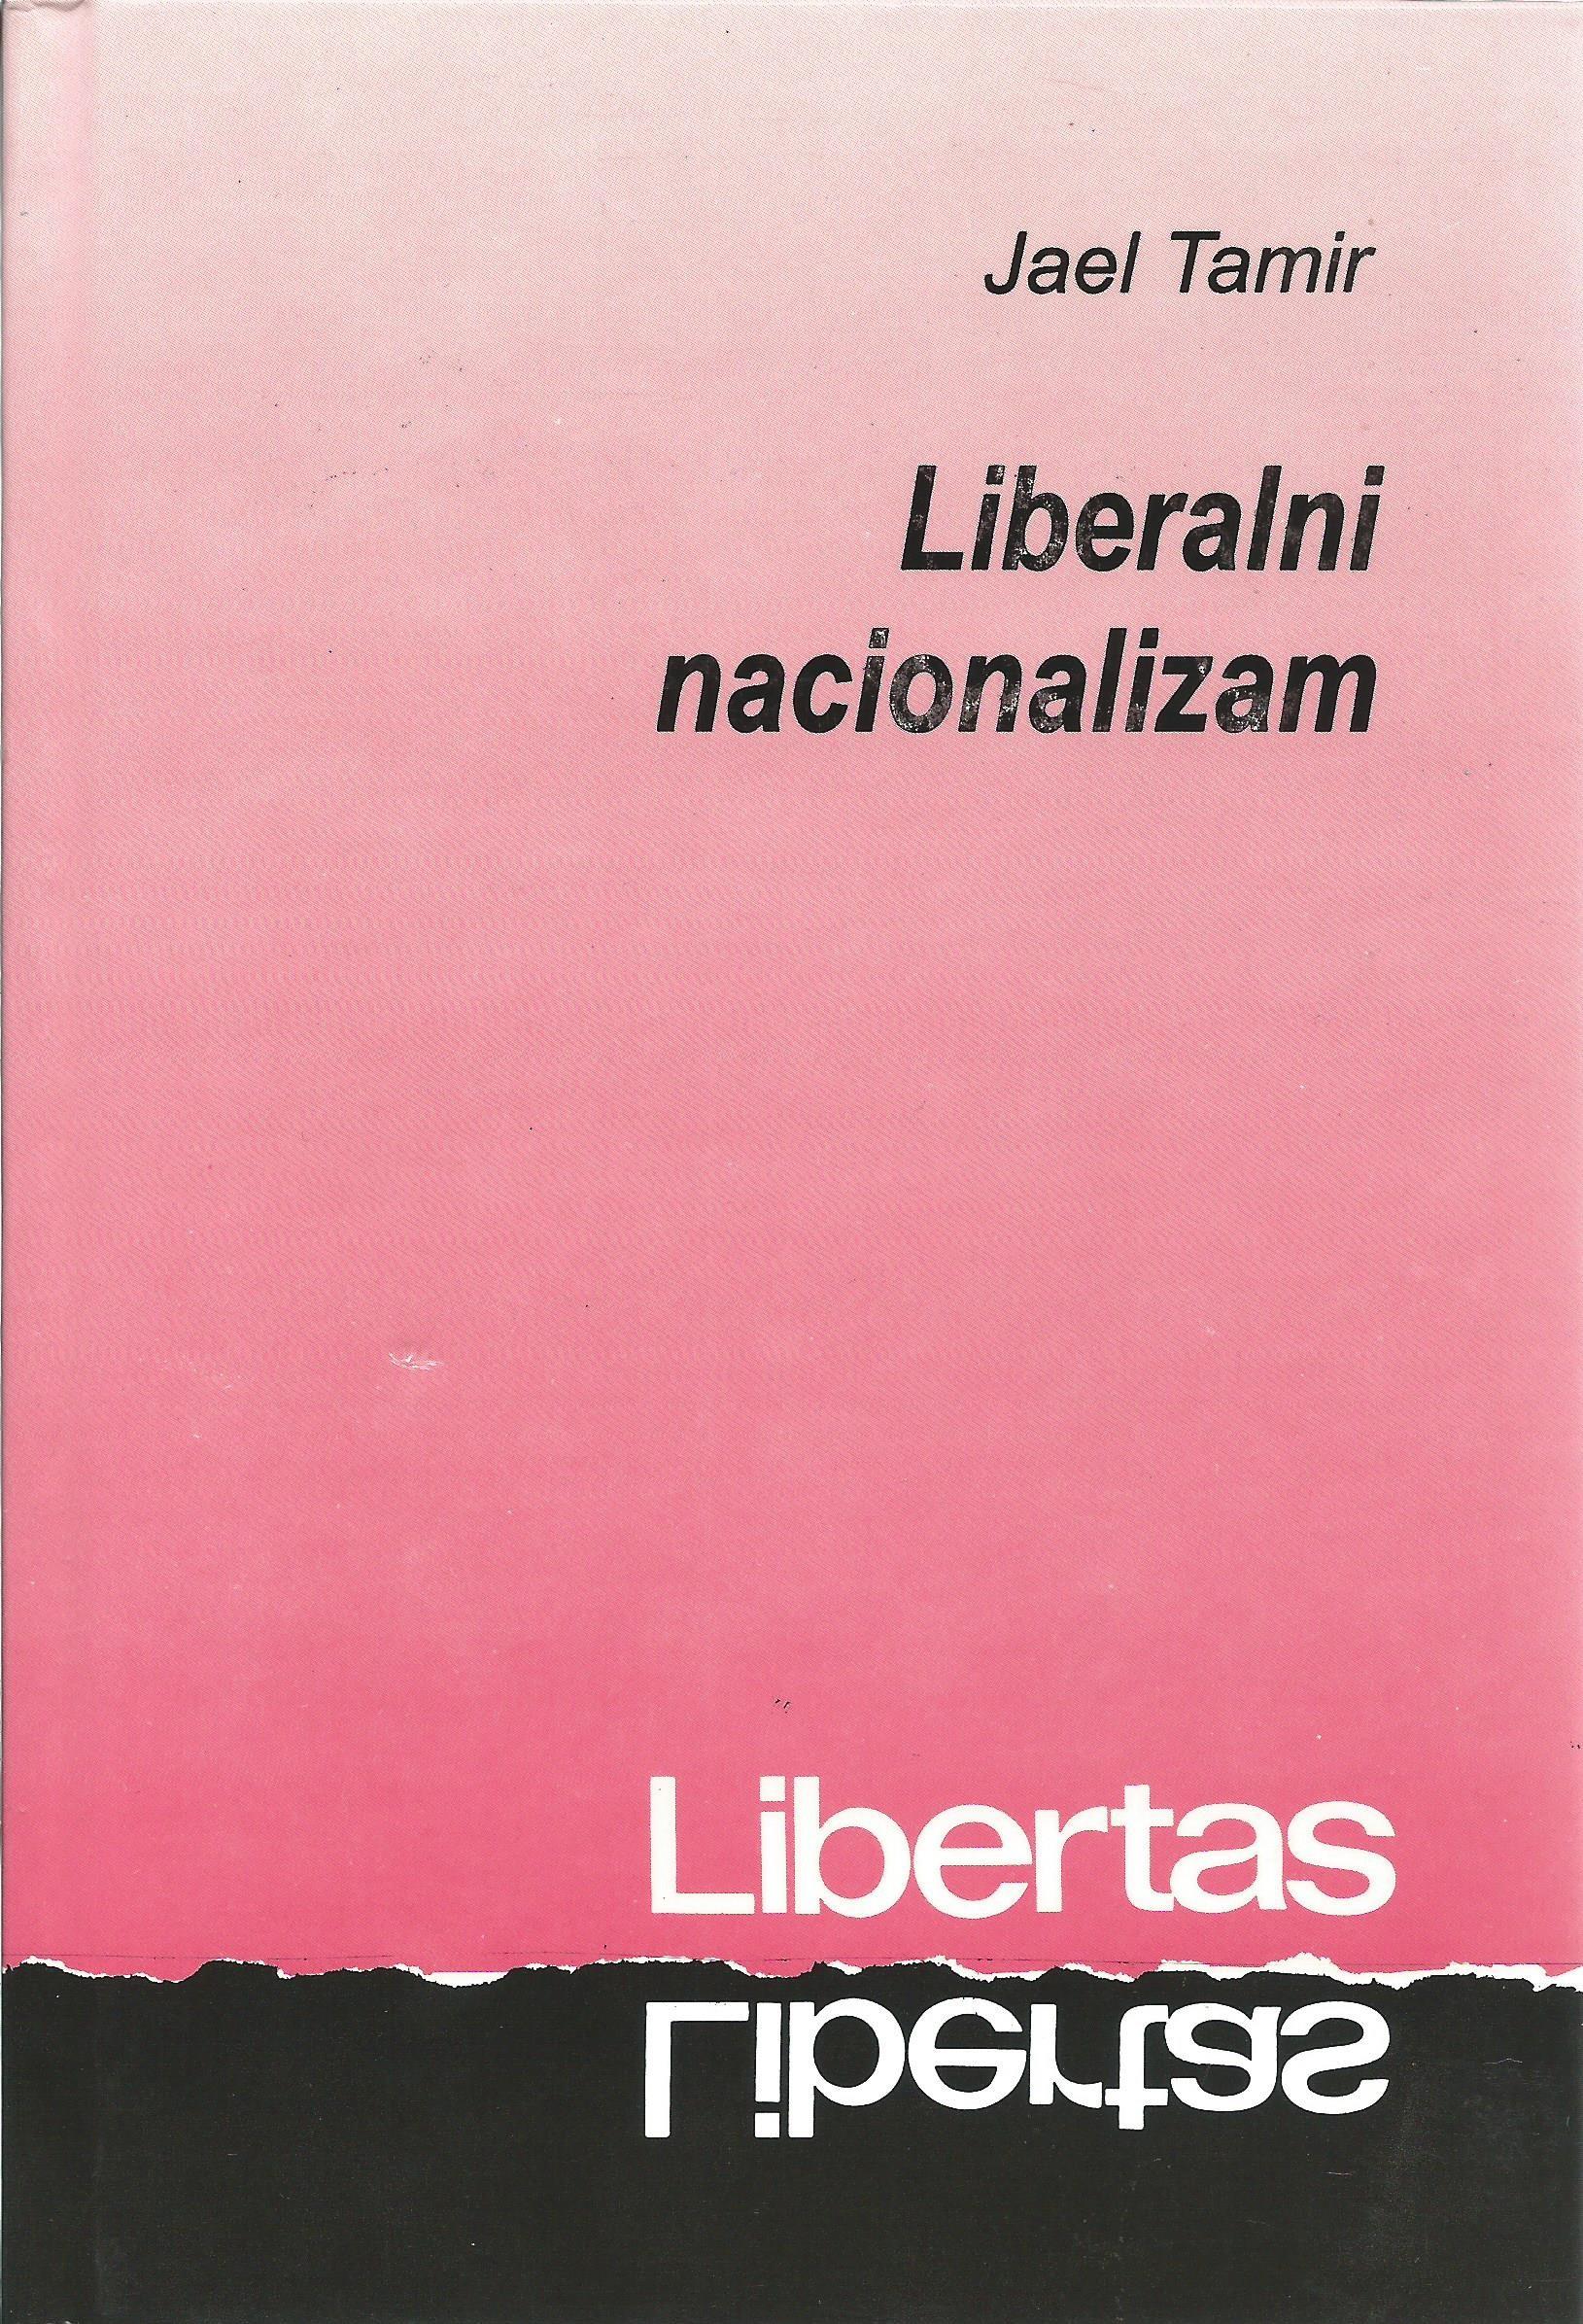 Liberalni nacionalizam filip visnjic